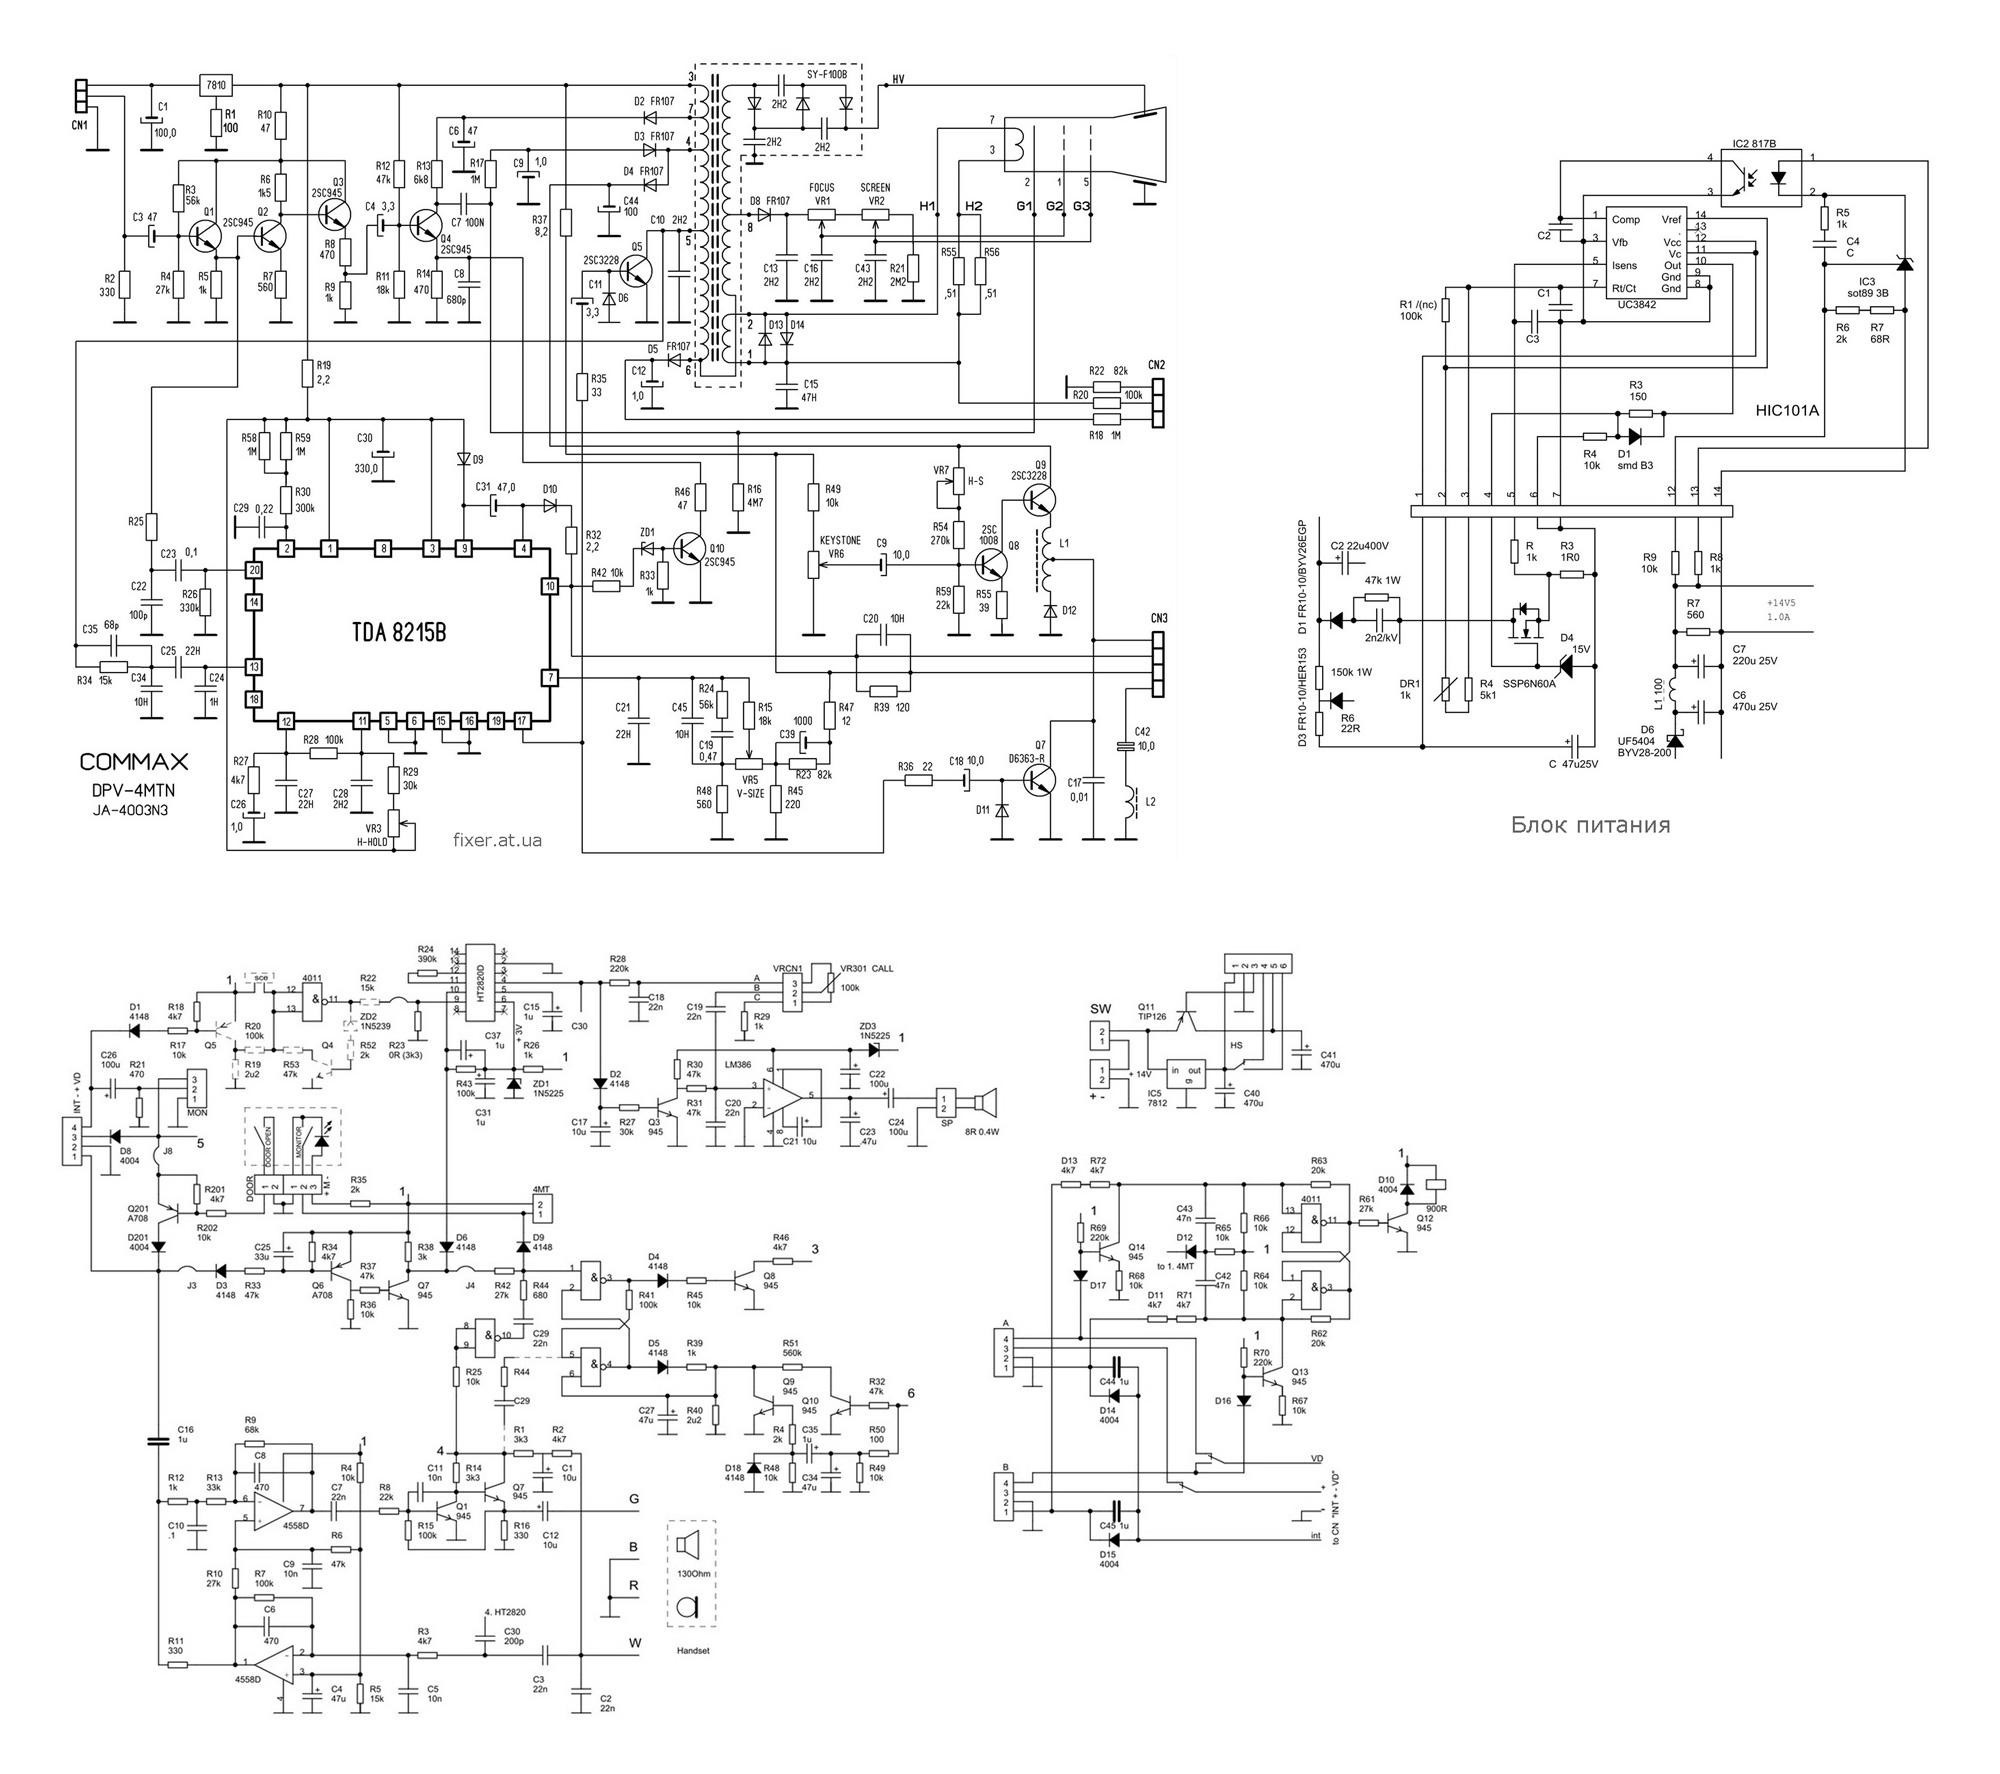 Commax dpv 4mtn схема фото 318